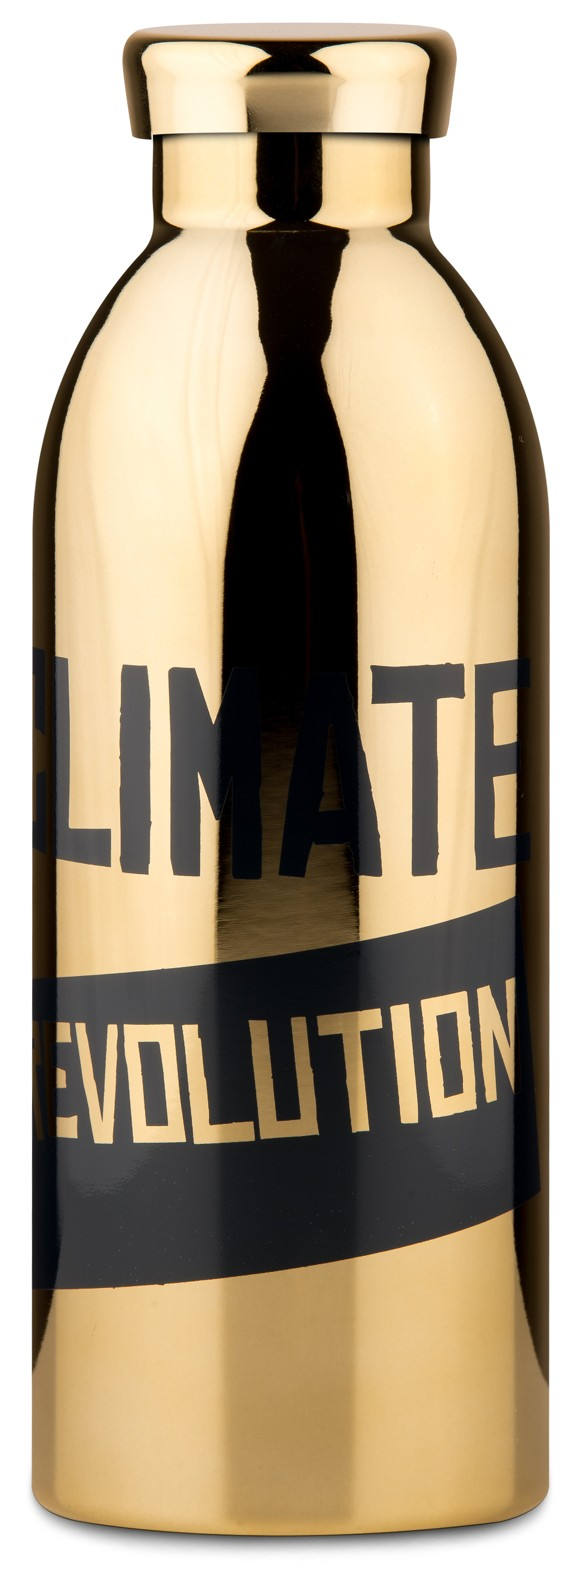 24 Bottles - Clima Bottle 0,5 L - Vivienne Westwood